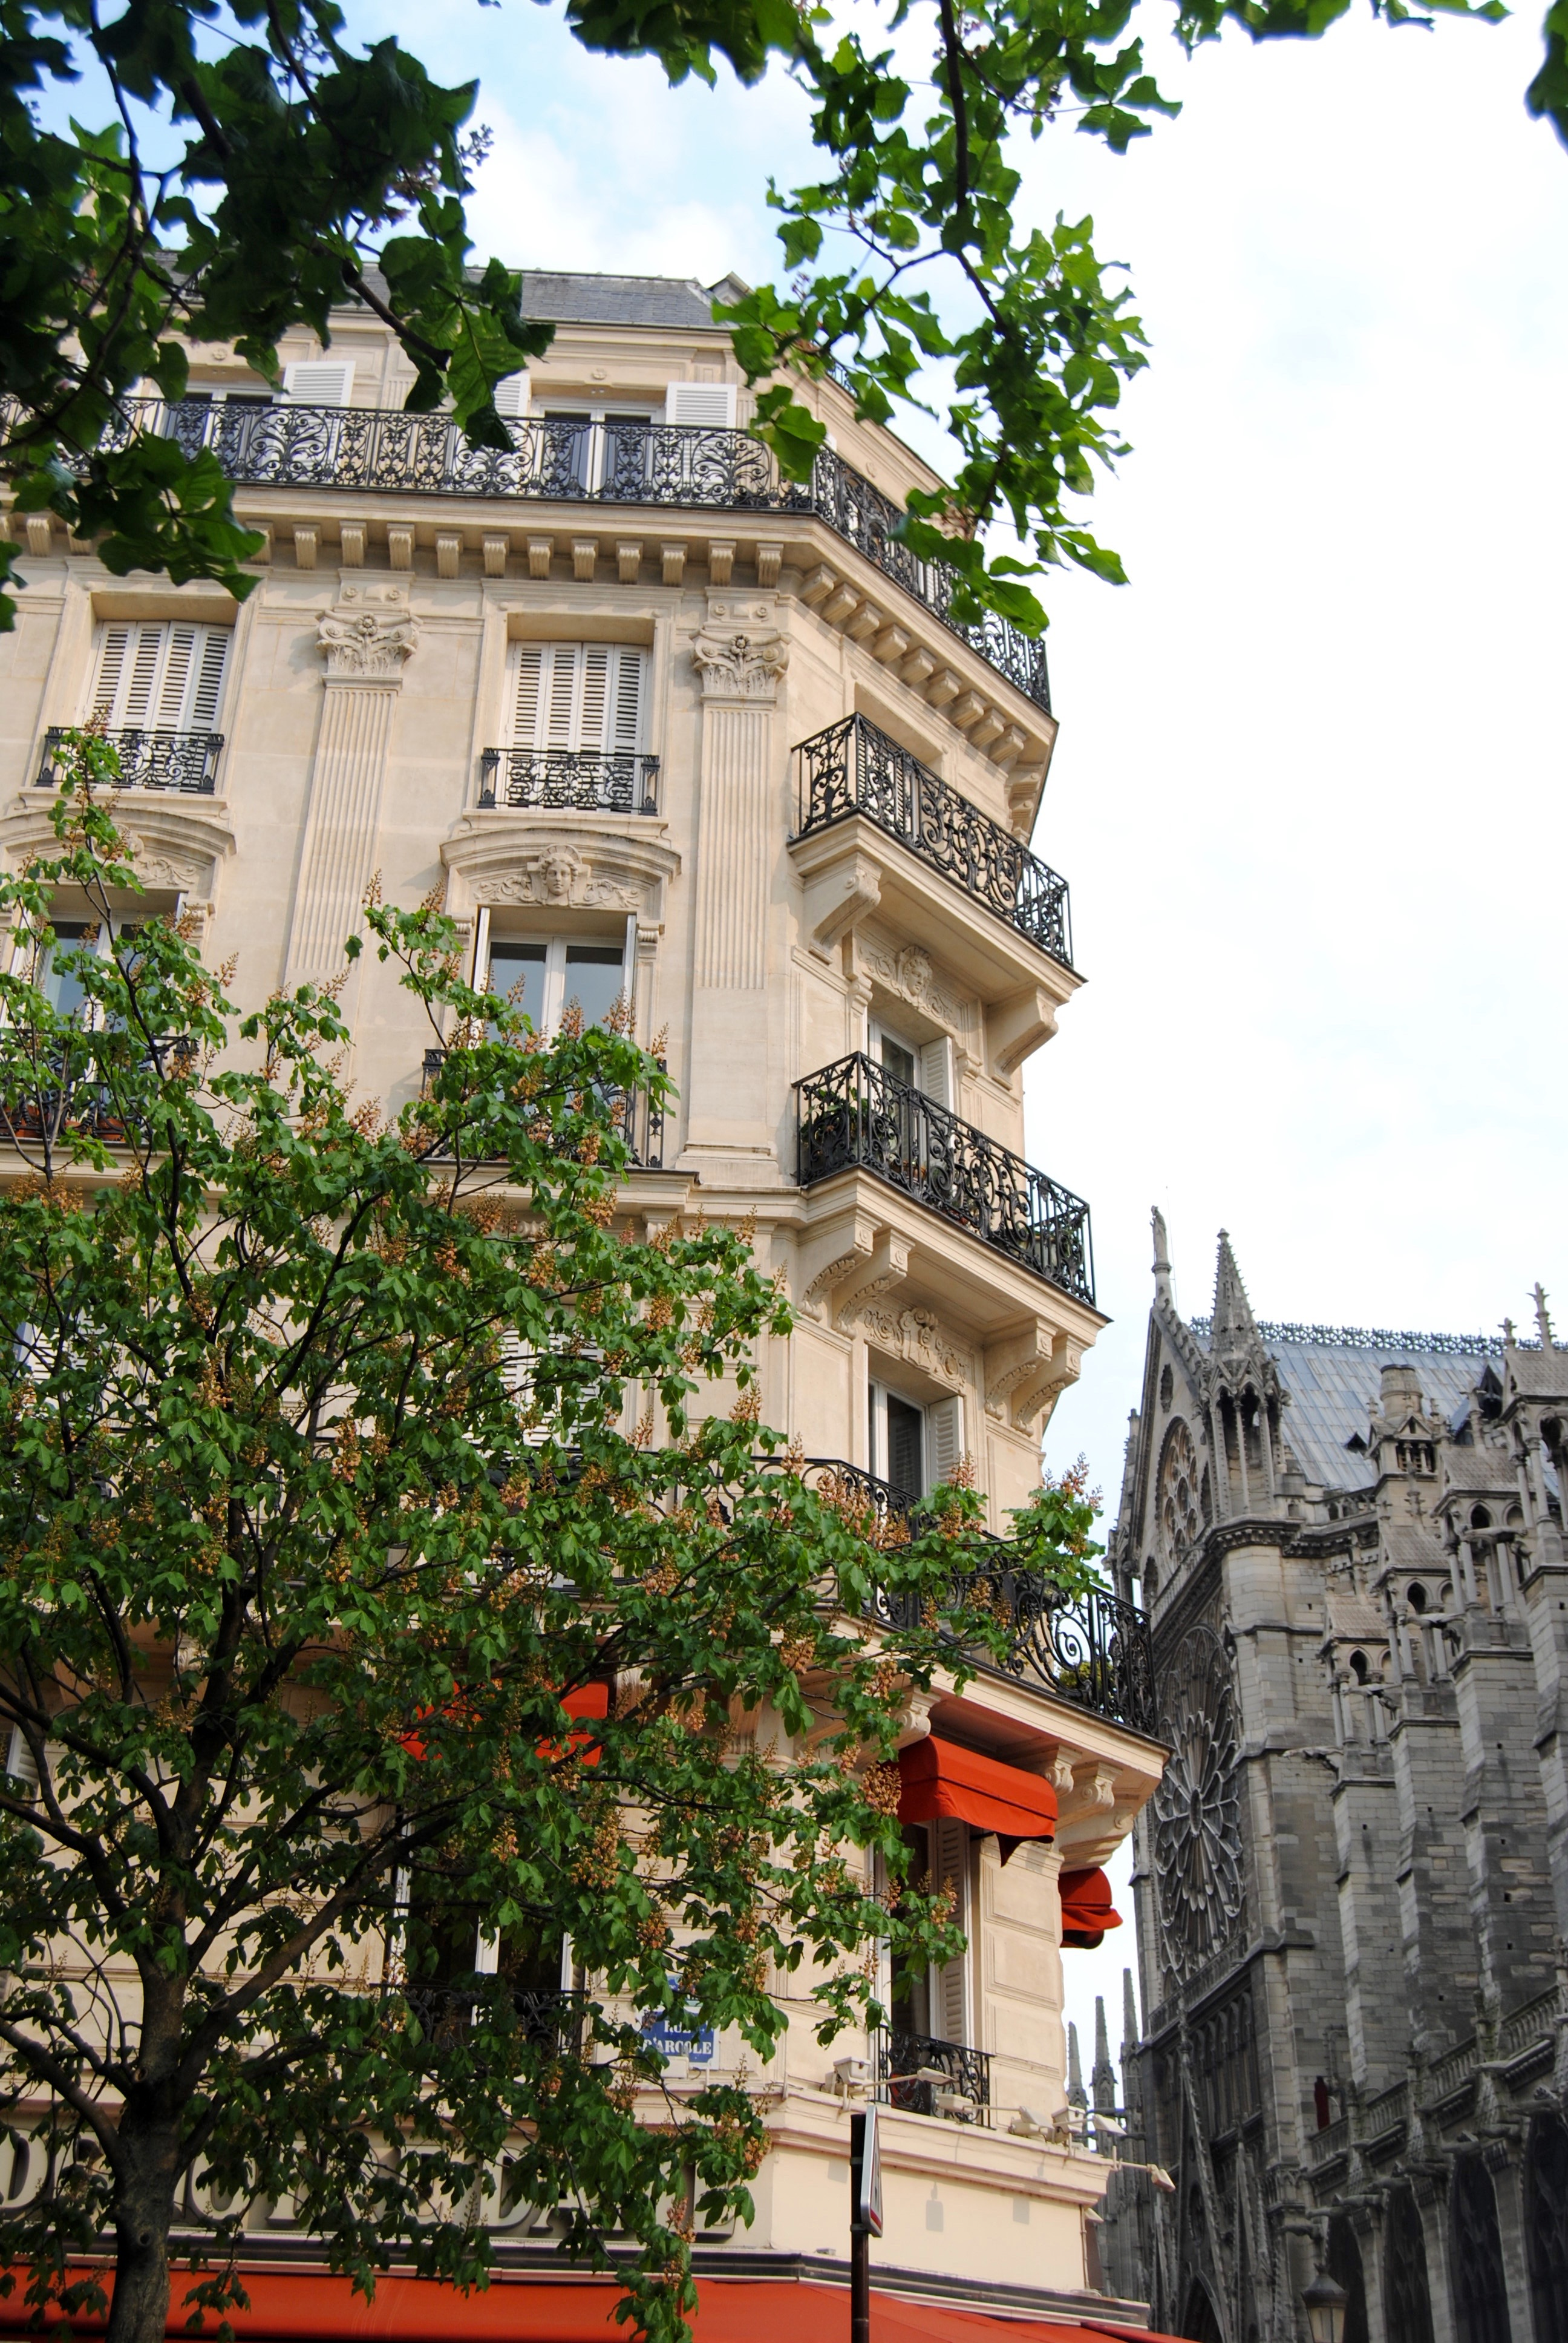 Parisian streets.